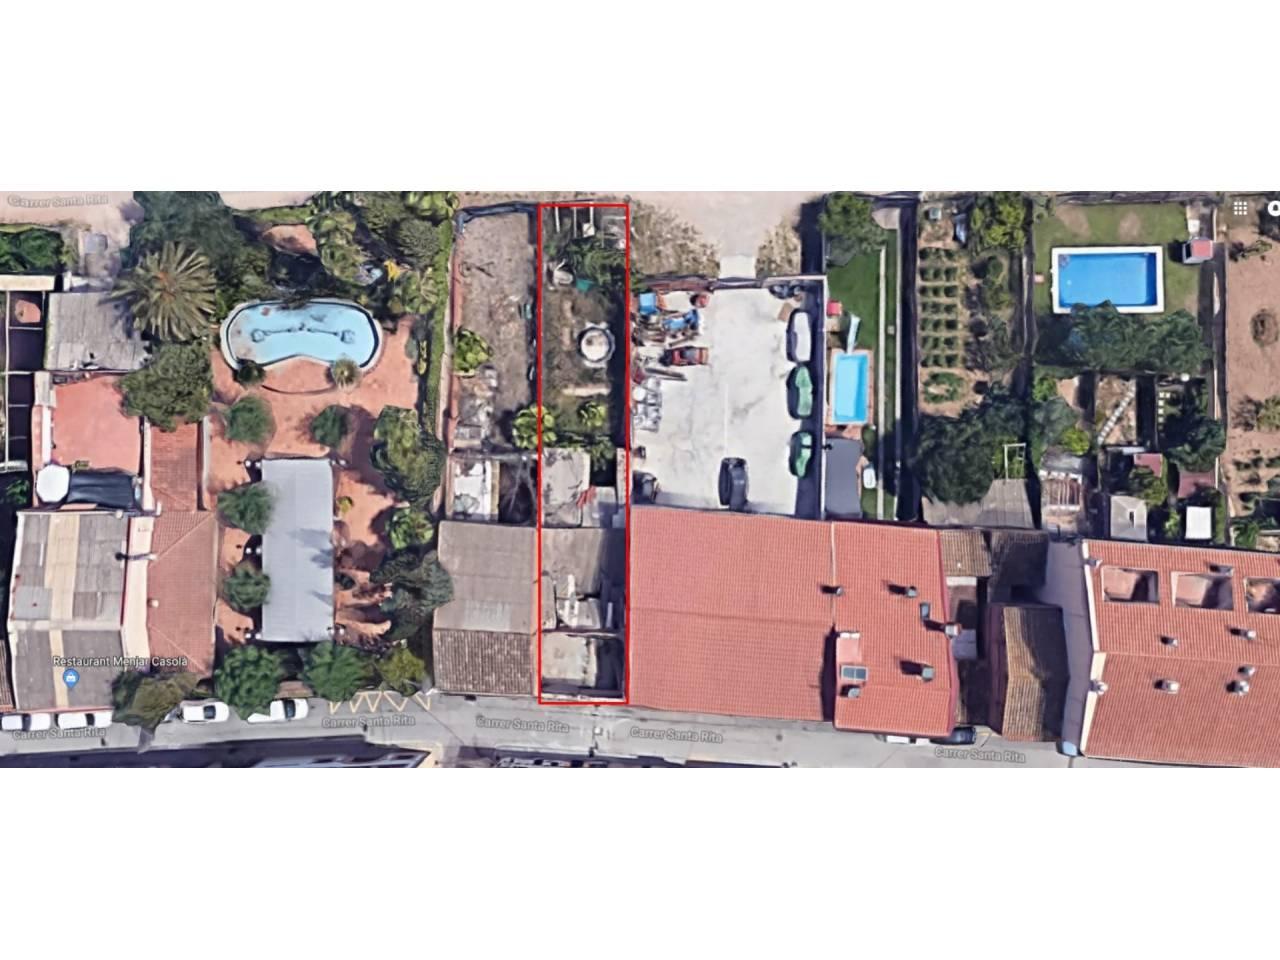 Terreny en venda en Castellbisbal - c/ Santa Rita